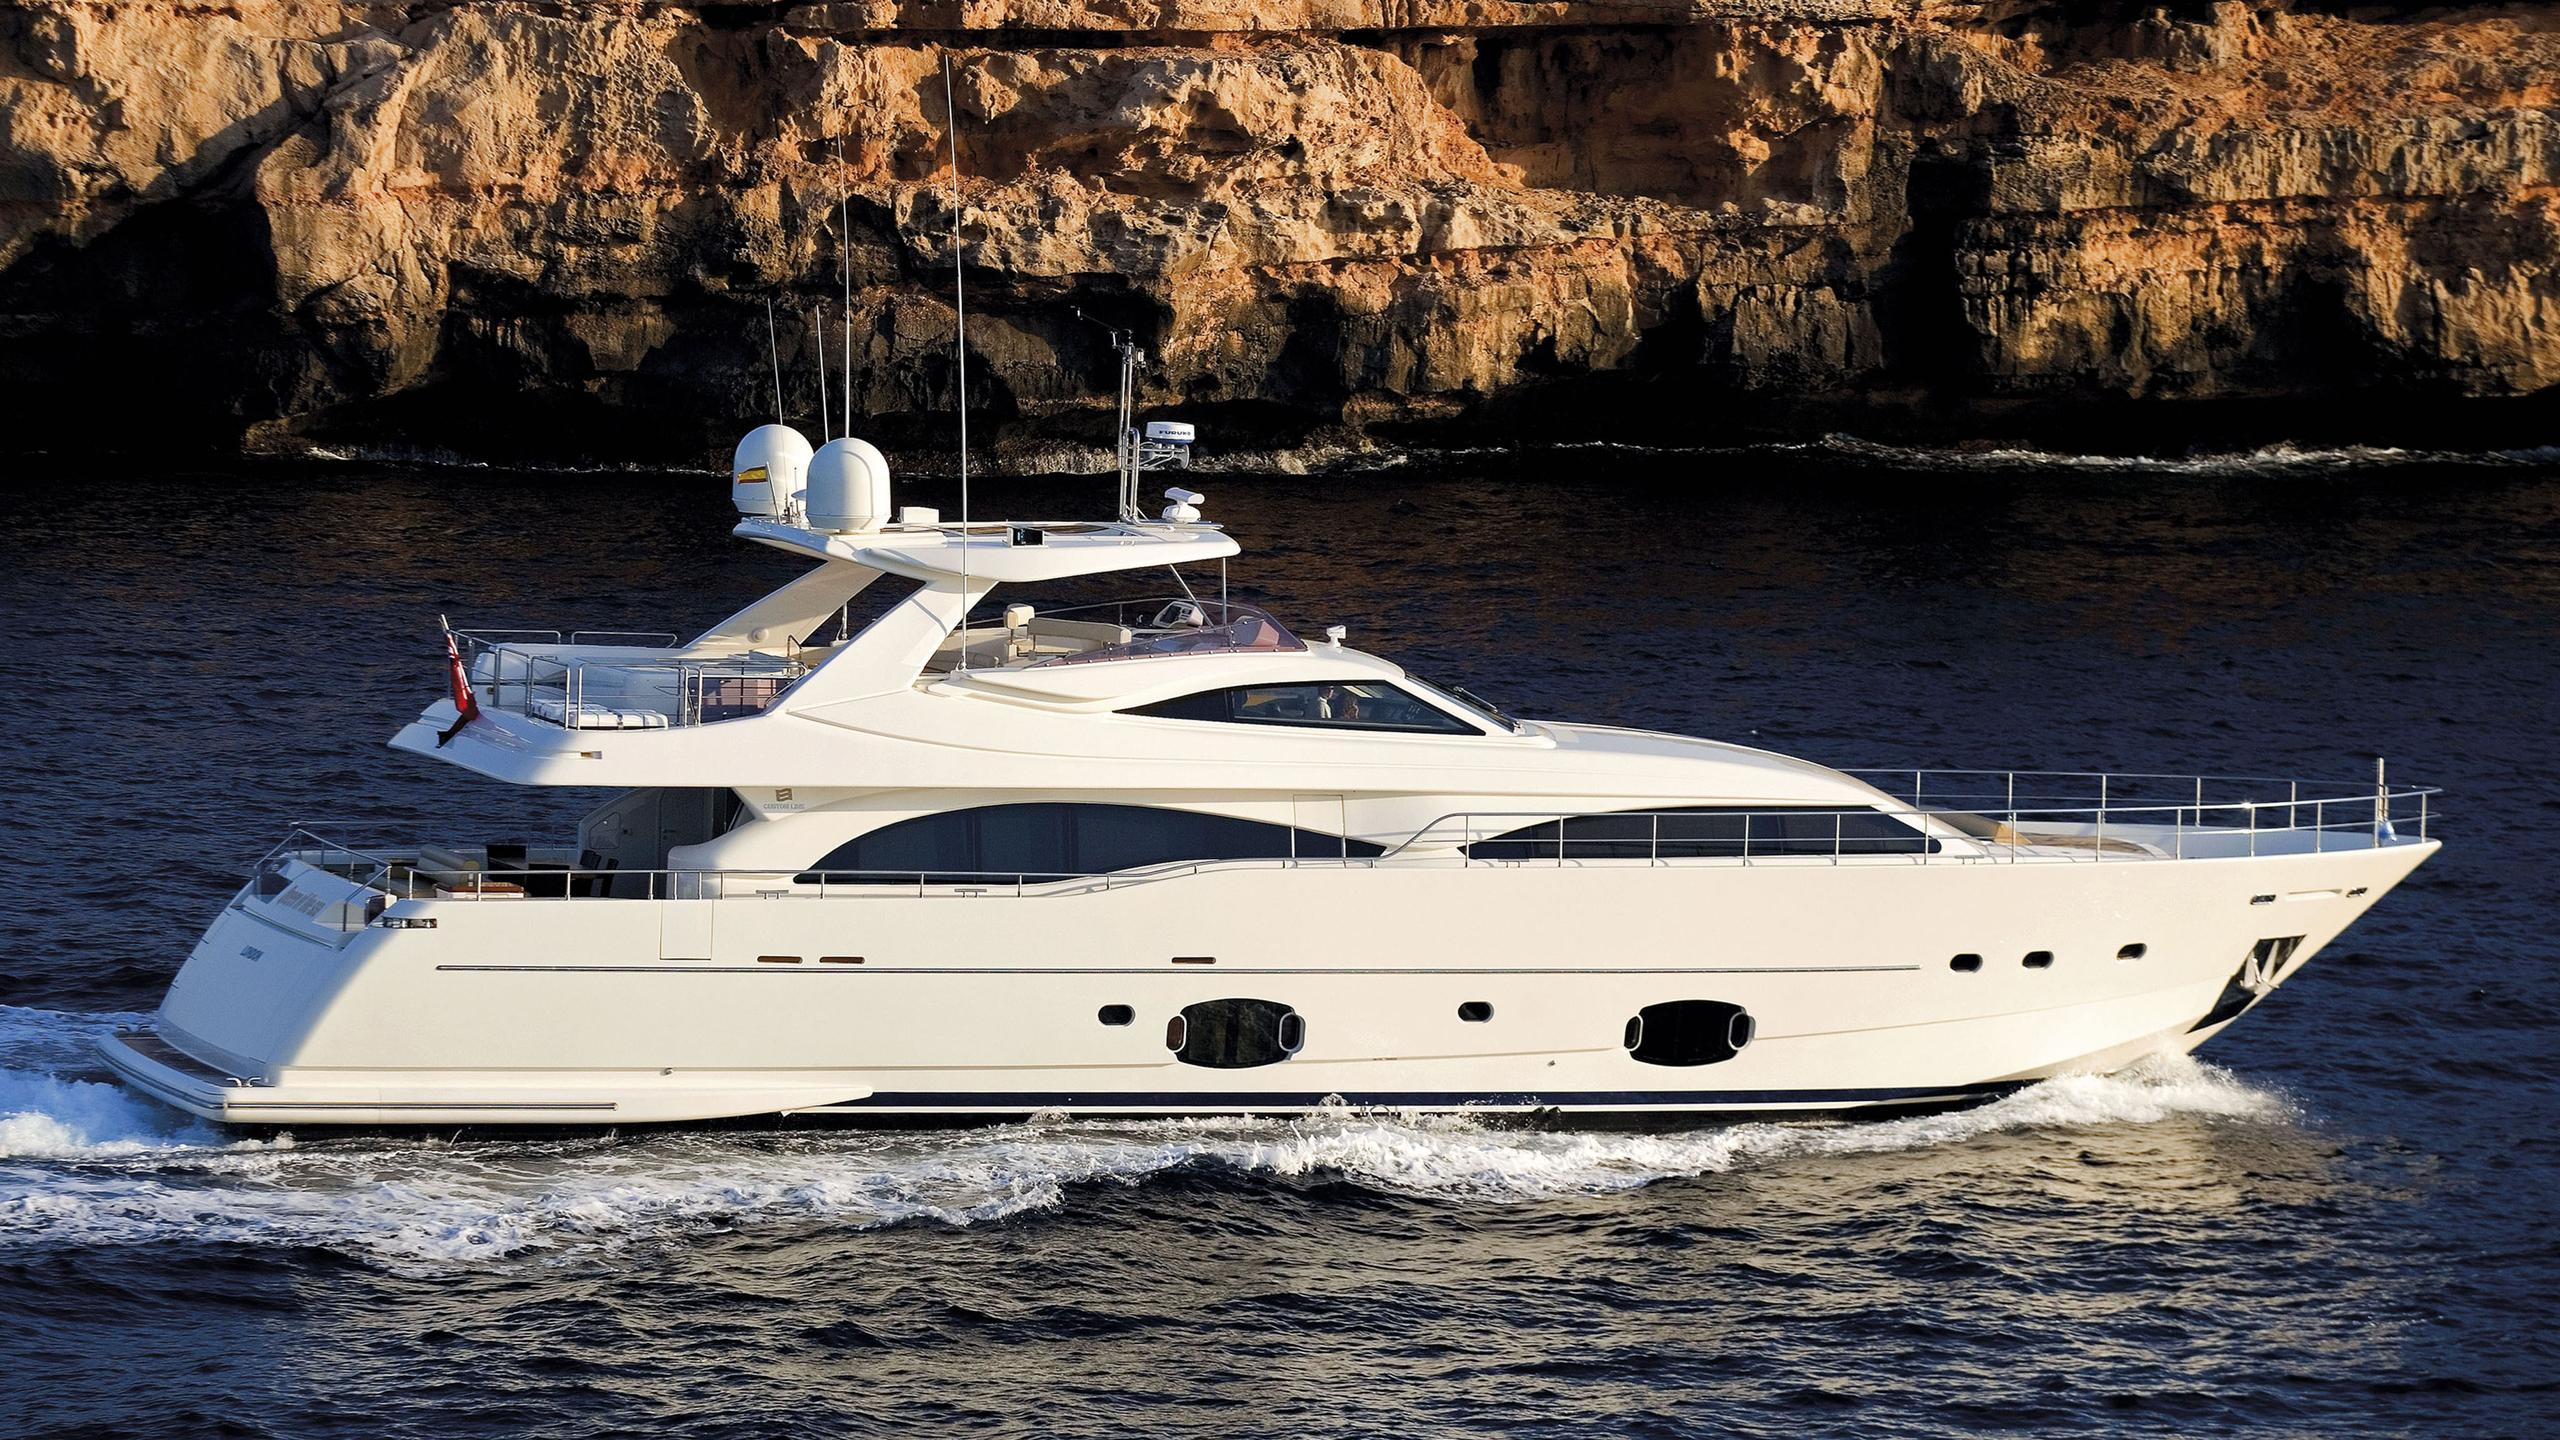 sea-lion-ii-motor-yacht-ferretti-custom-line-97-2006-29m-cruising